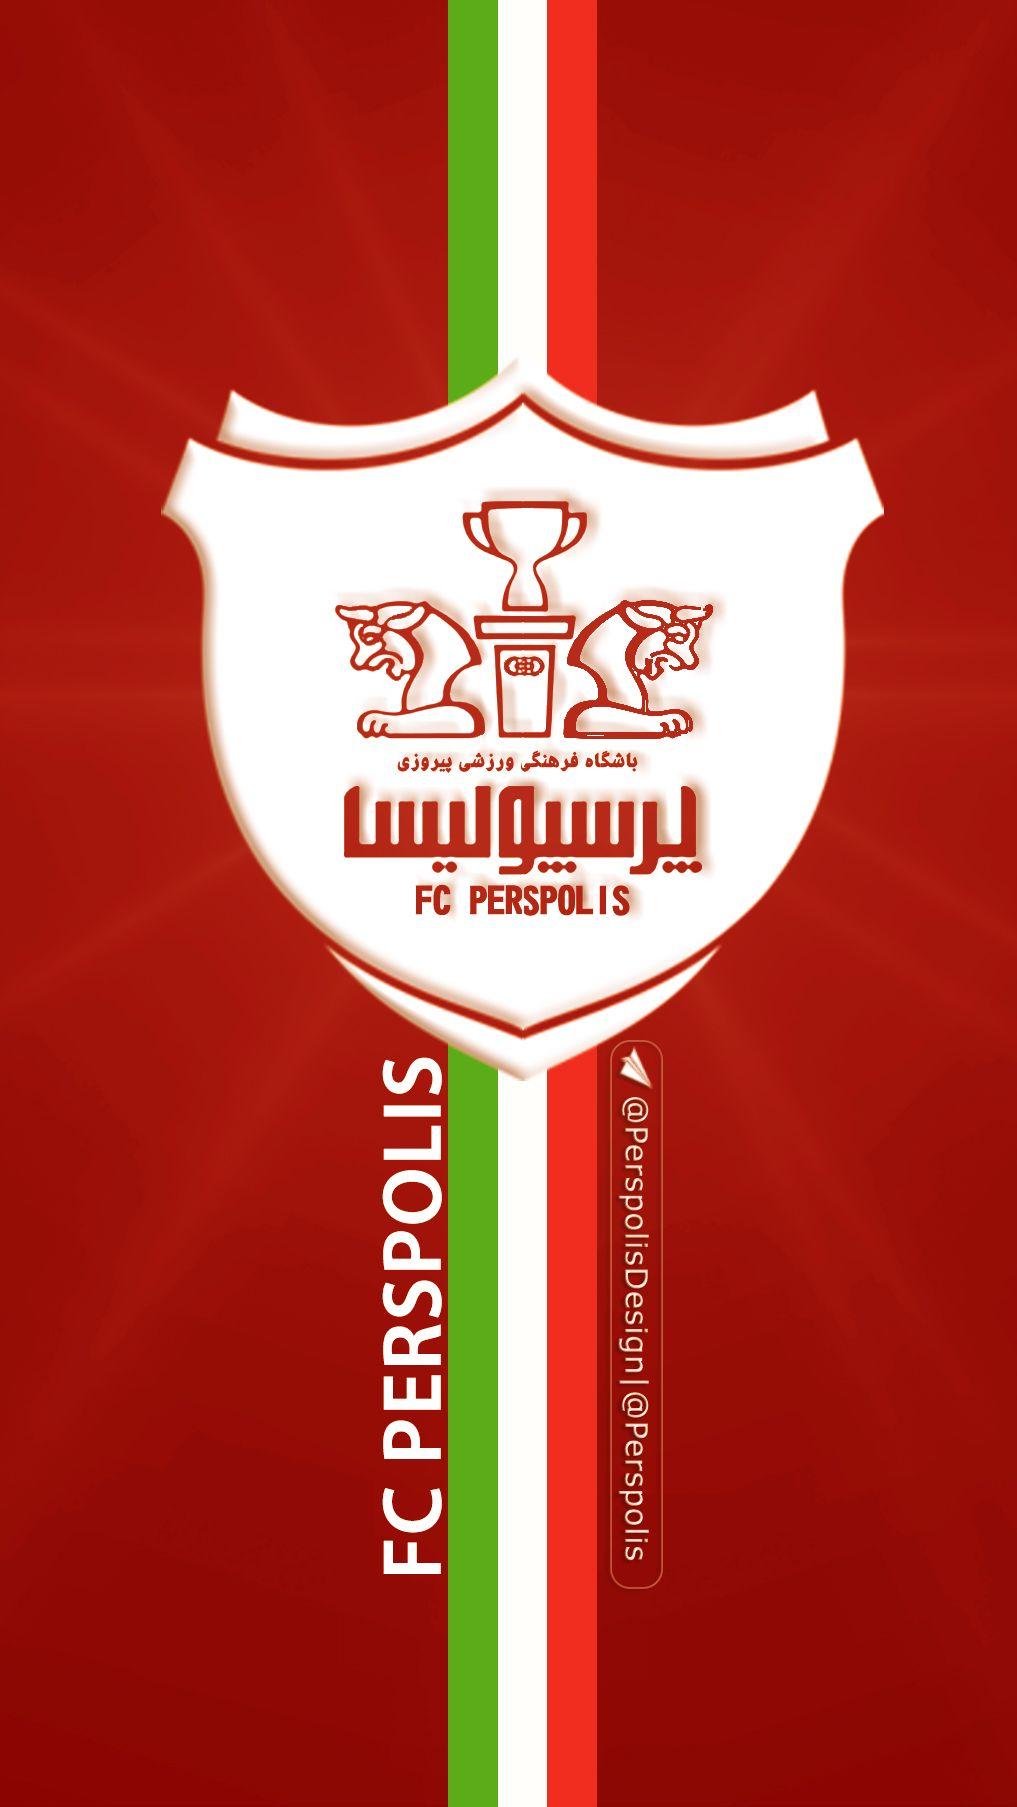 Pin By Amd On Perspolis Iran National Football Team Iran Football Football Wallpaper